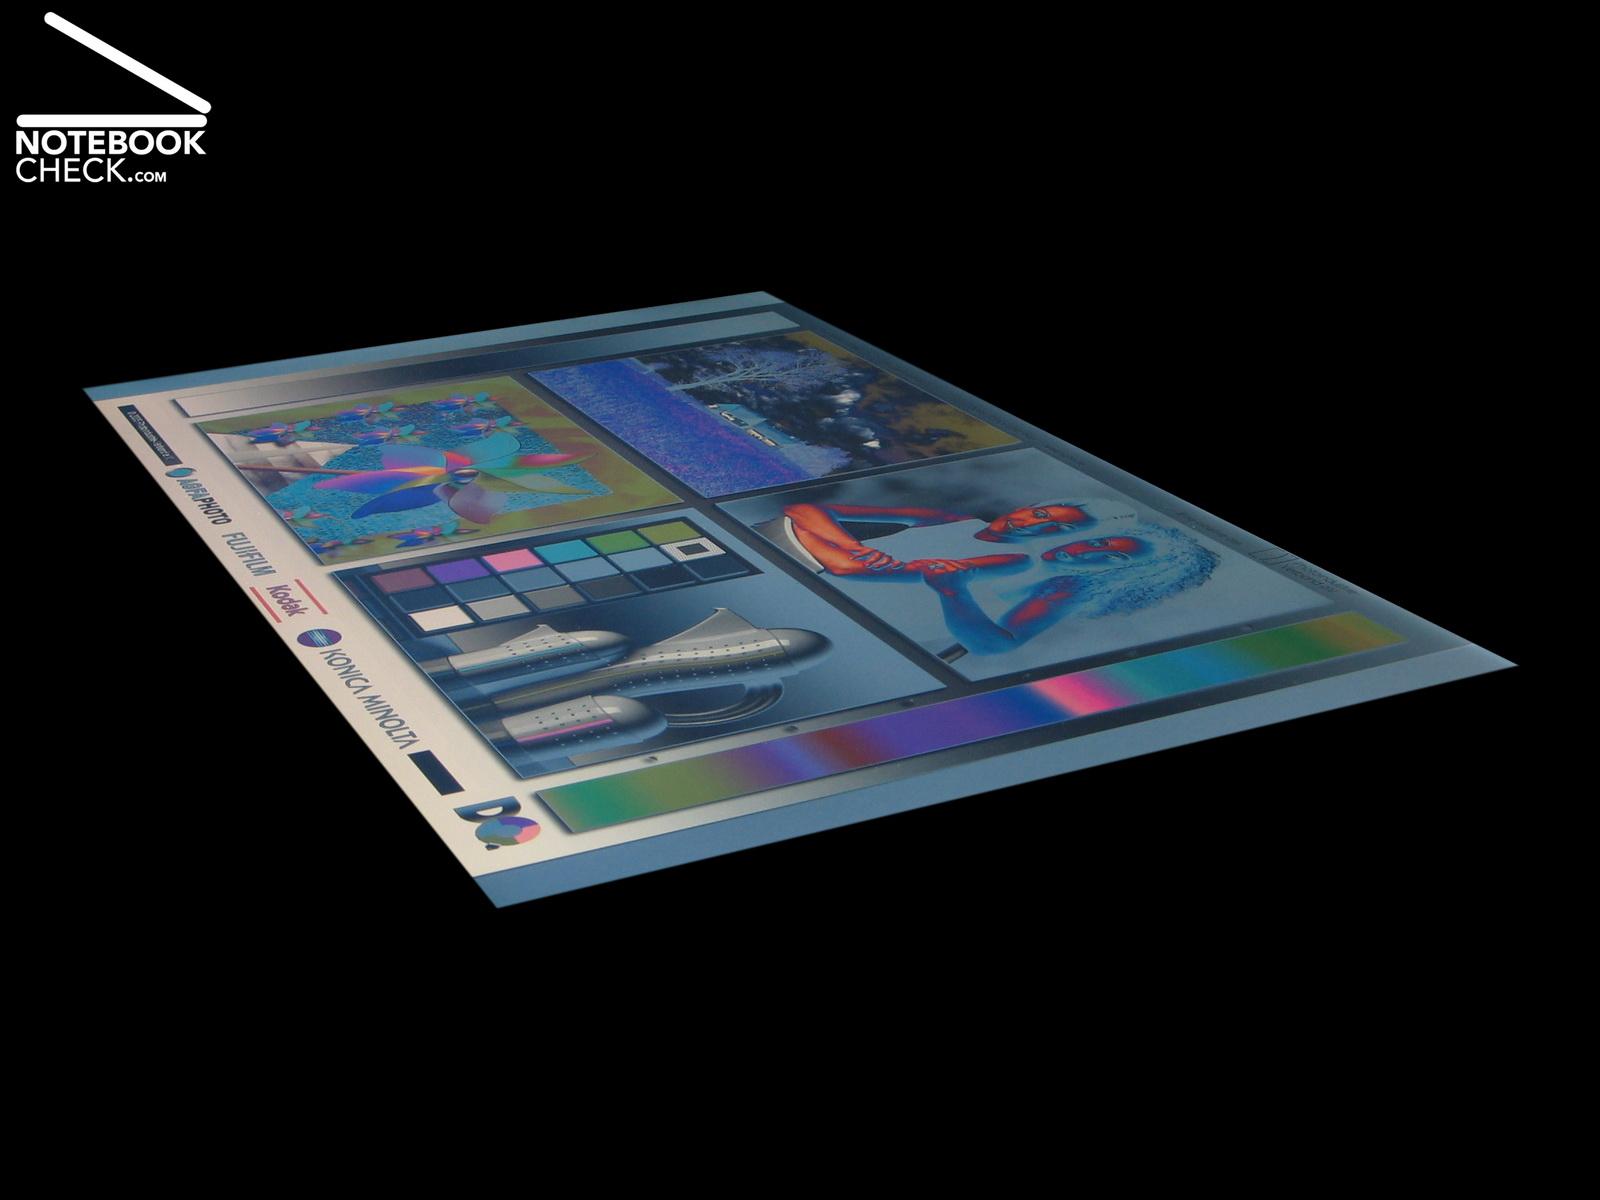 Ati Radeon Xpress 1250 driver for Windows 7 file free download direct